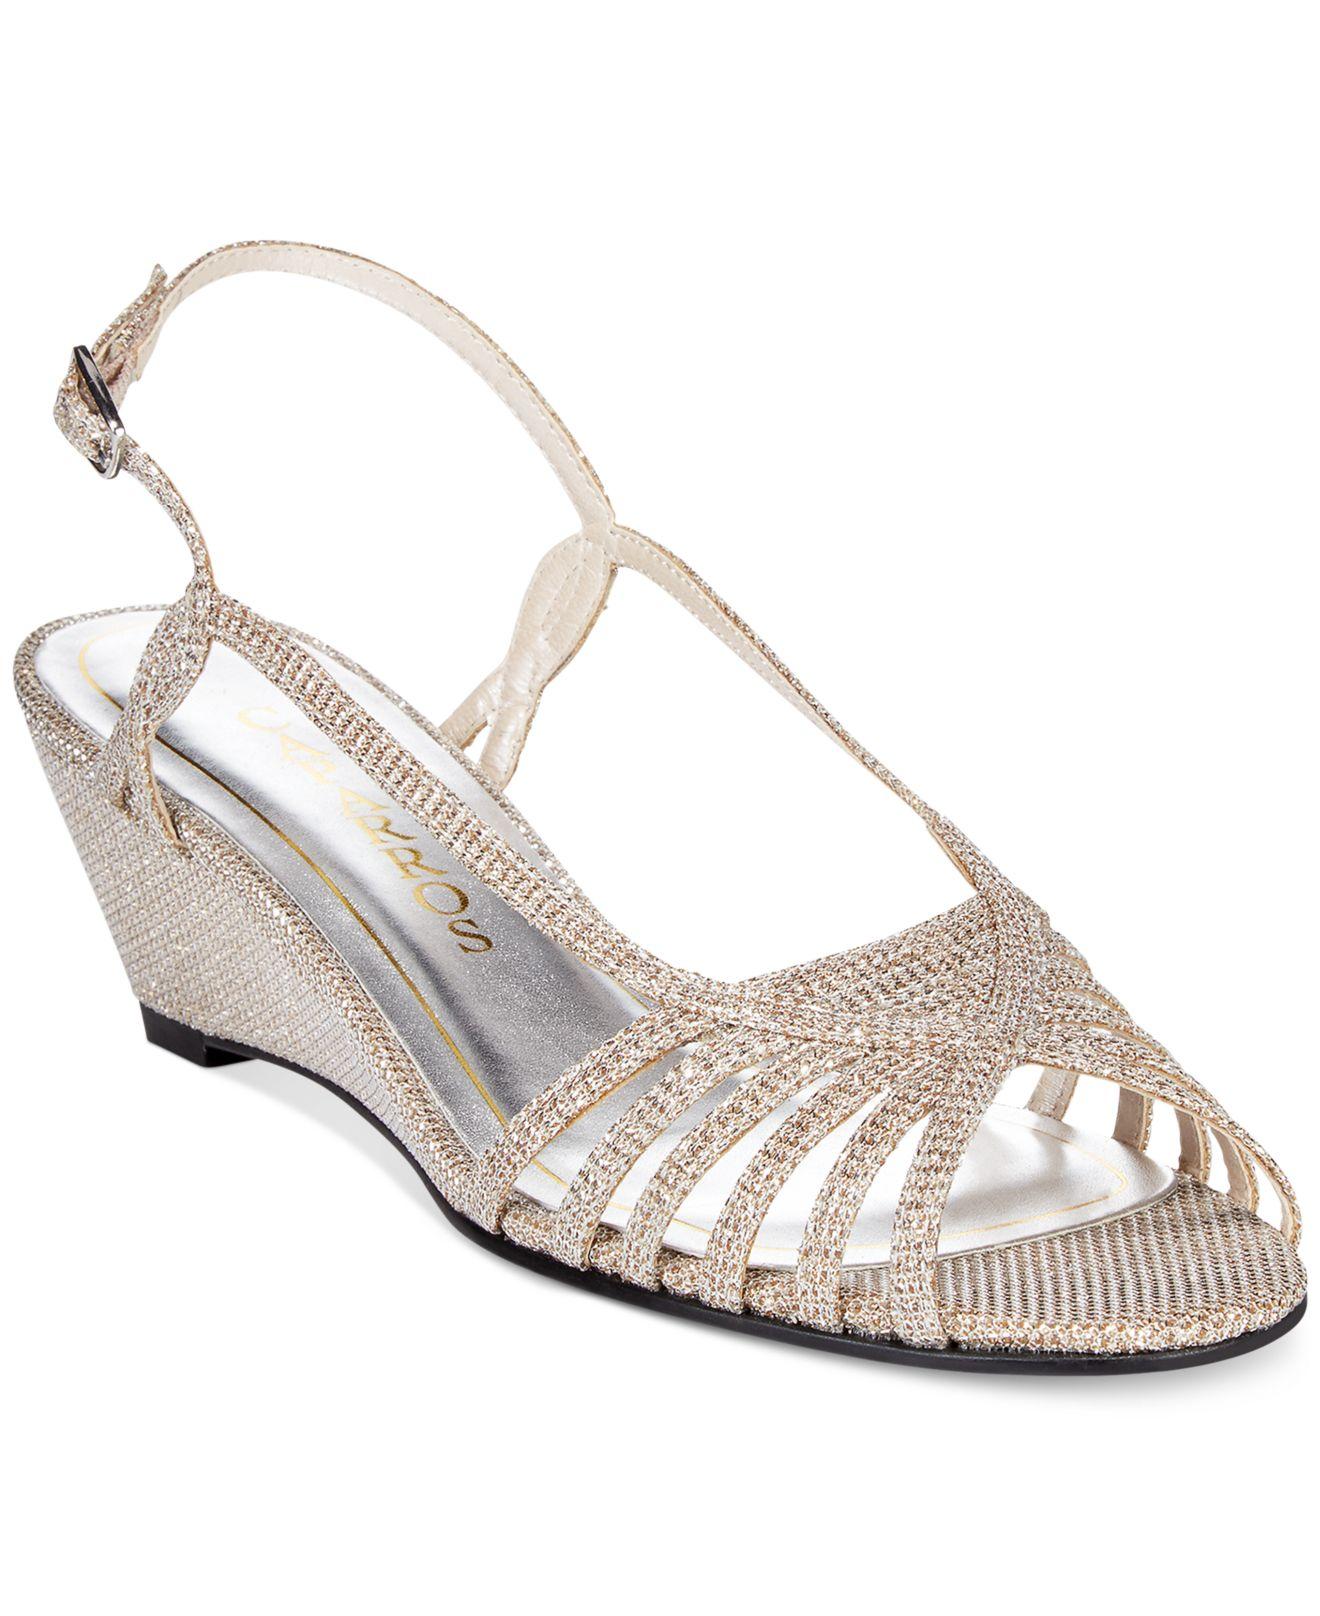 caparros wedge evening sandals in metallic lyst